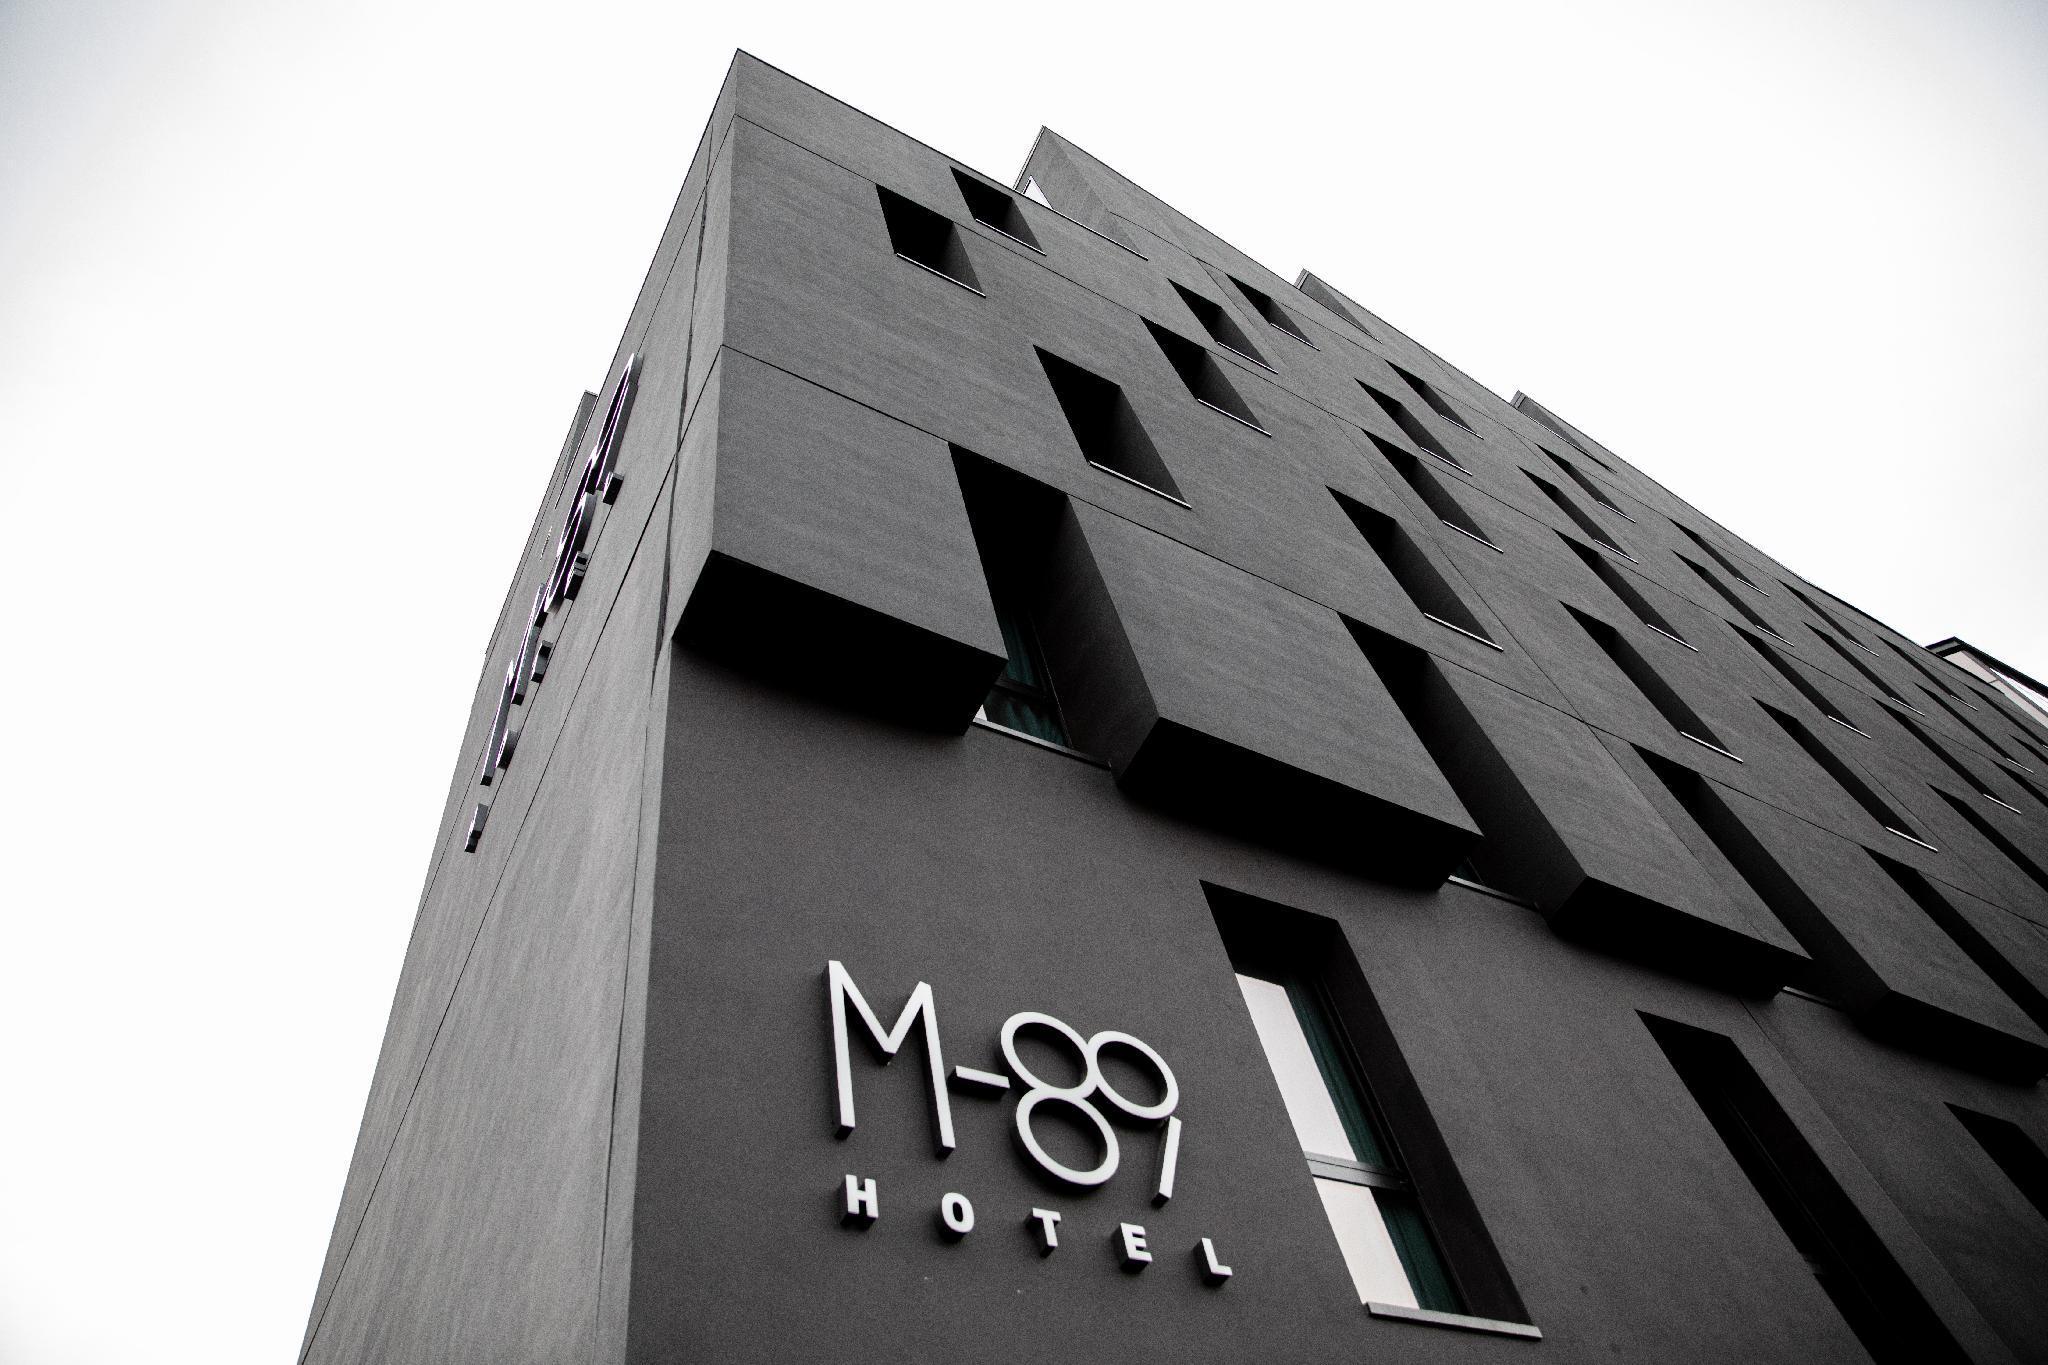 M89 HOTEL MILANO